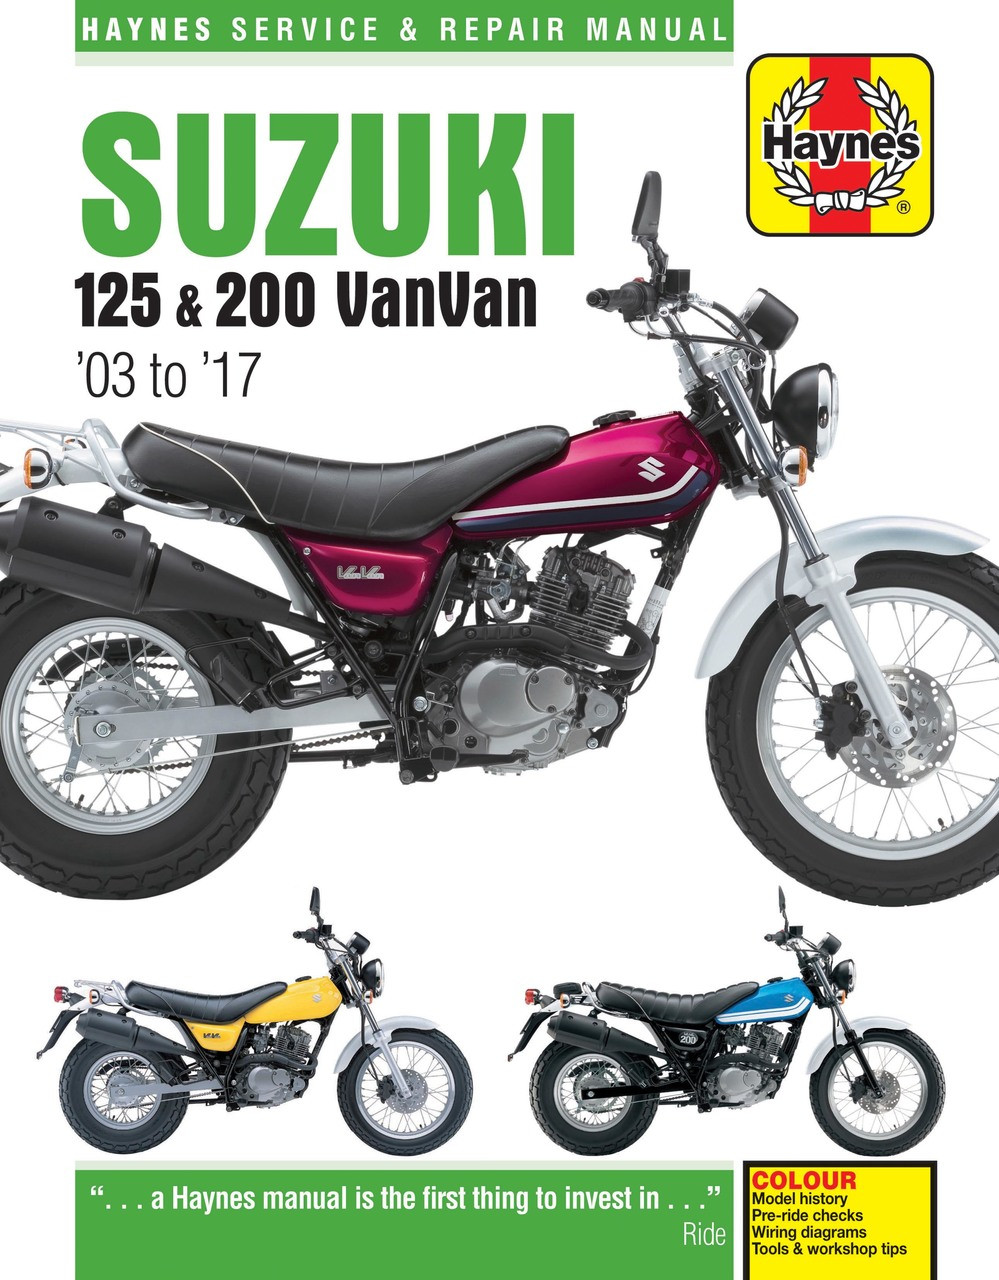 medium resolution of suzuki rv125 rv200 vanvan 2003 2017 workshop manual suzuki rv 125 wiring diagram suzuki rv 125 wiring diagram